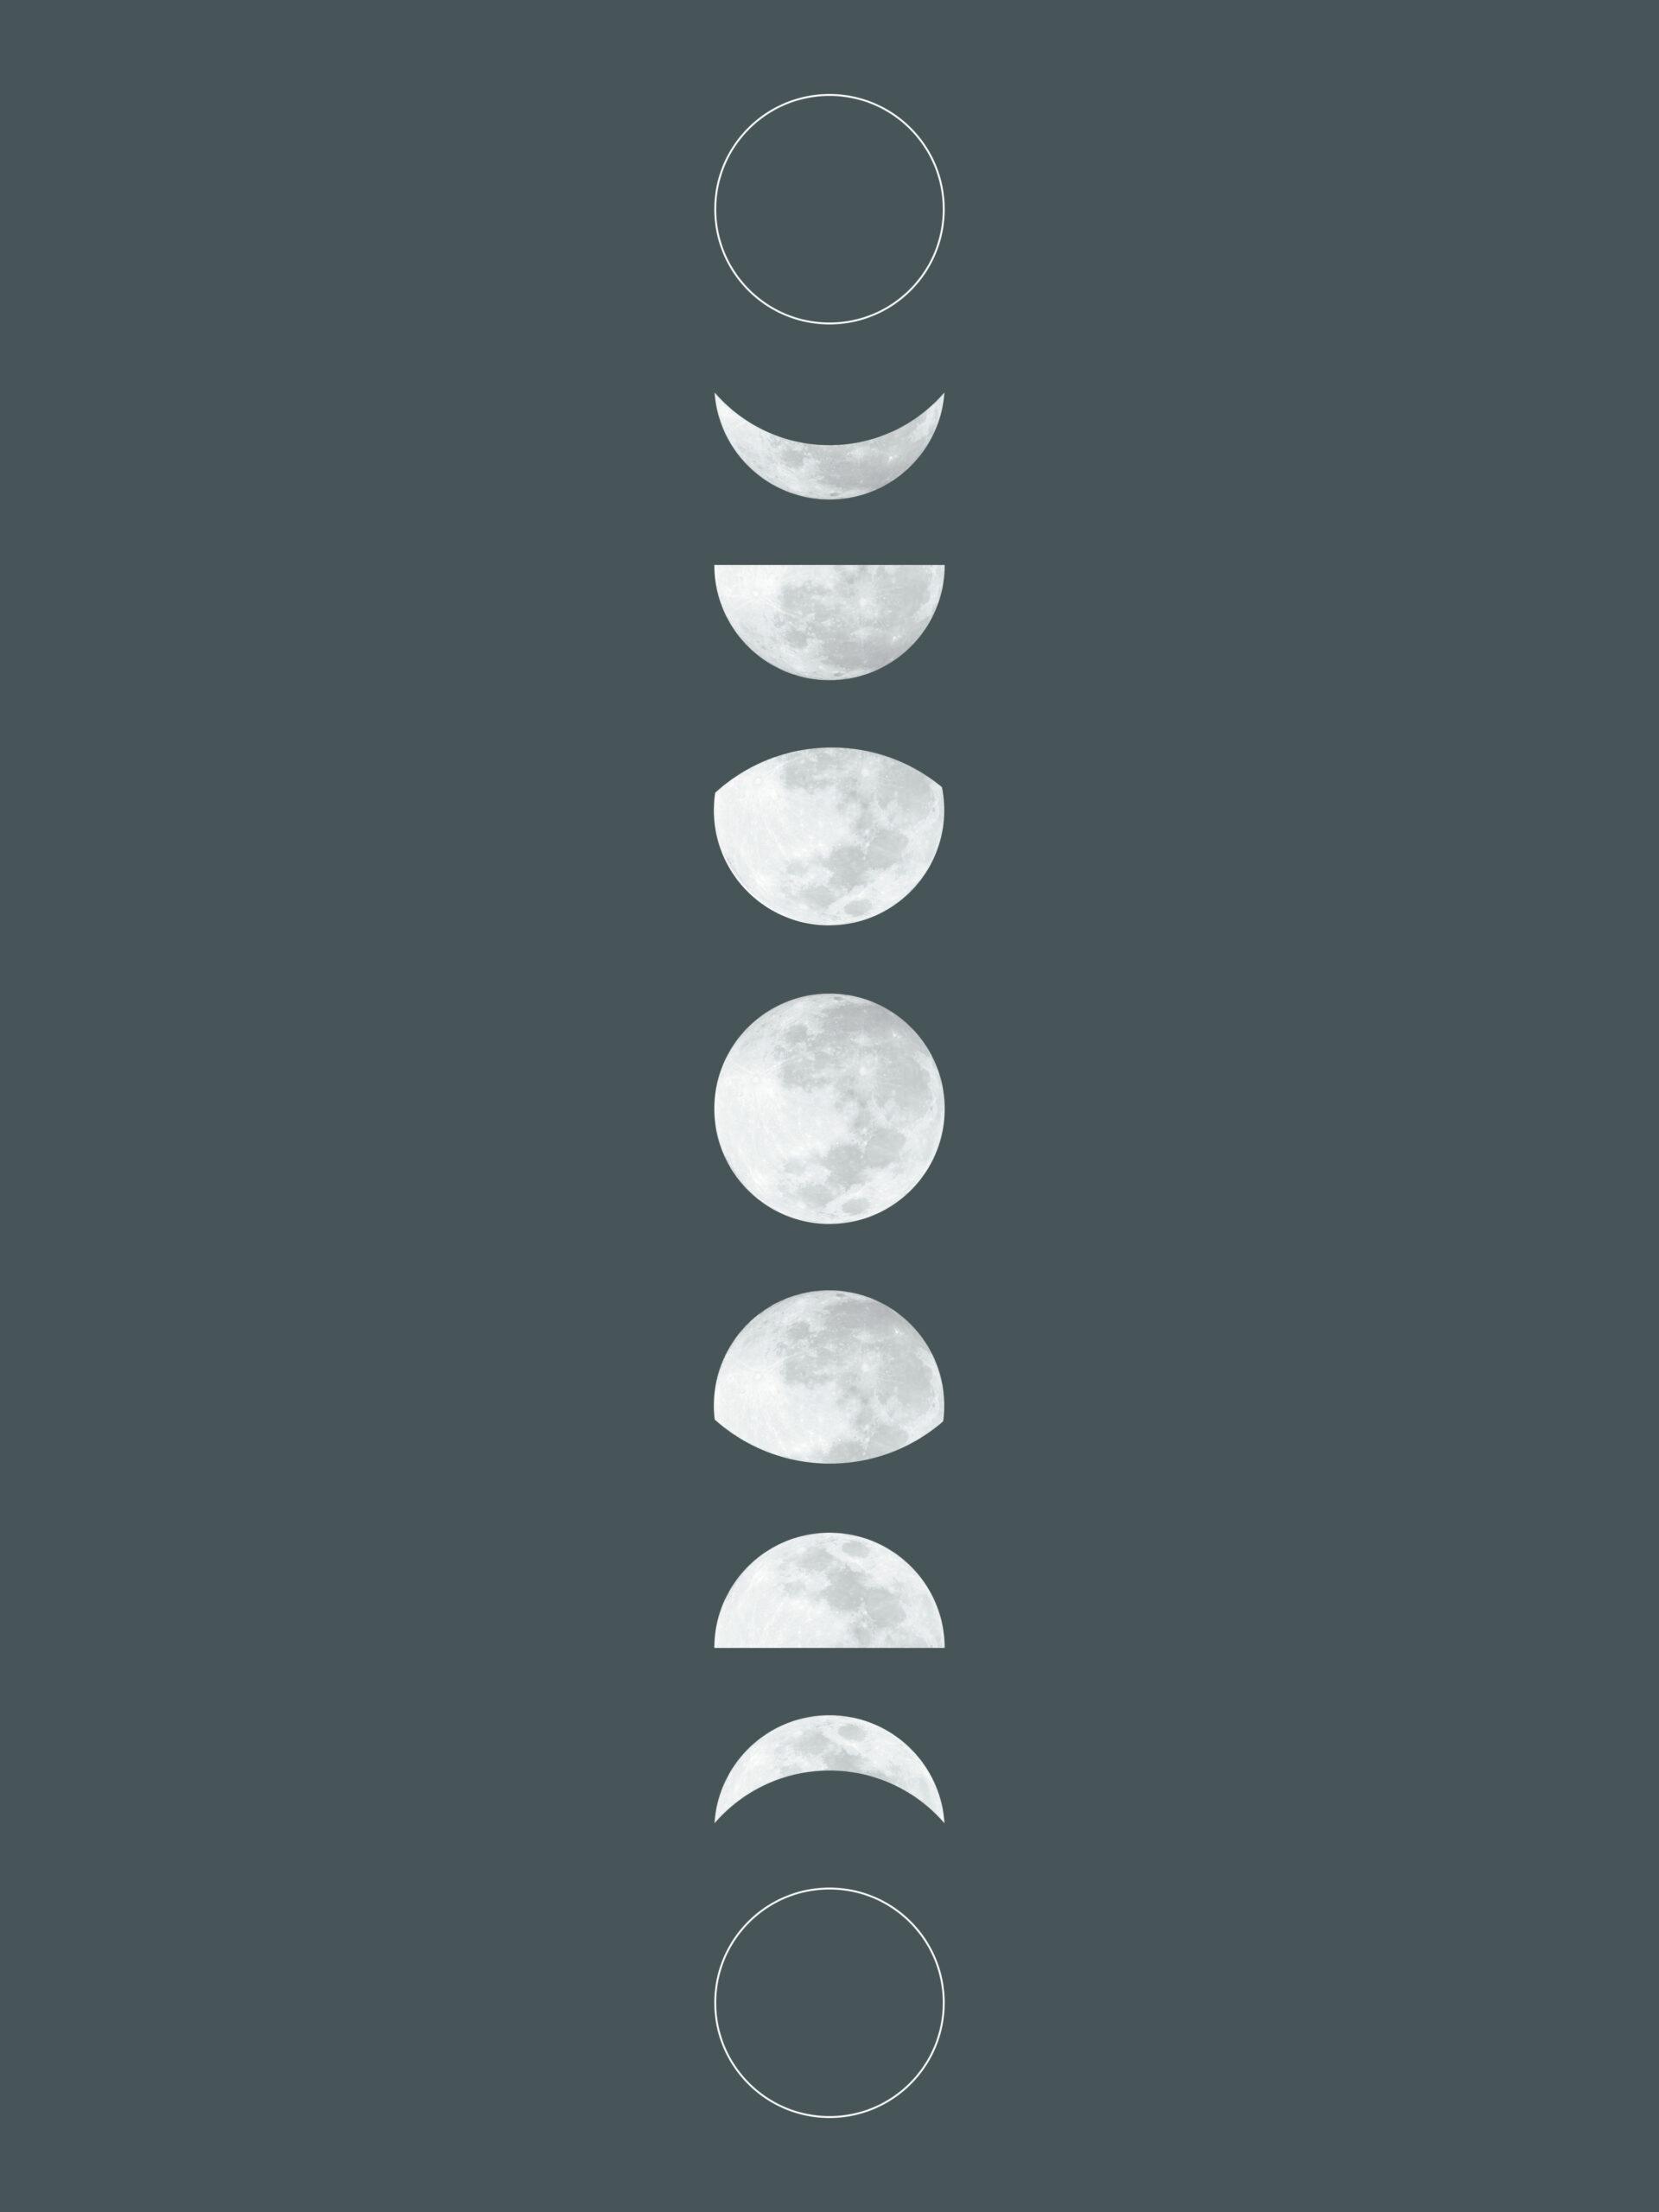 Pin On Printables inside Phases Moon Printable